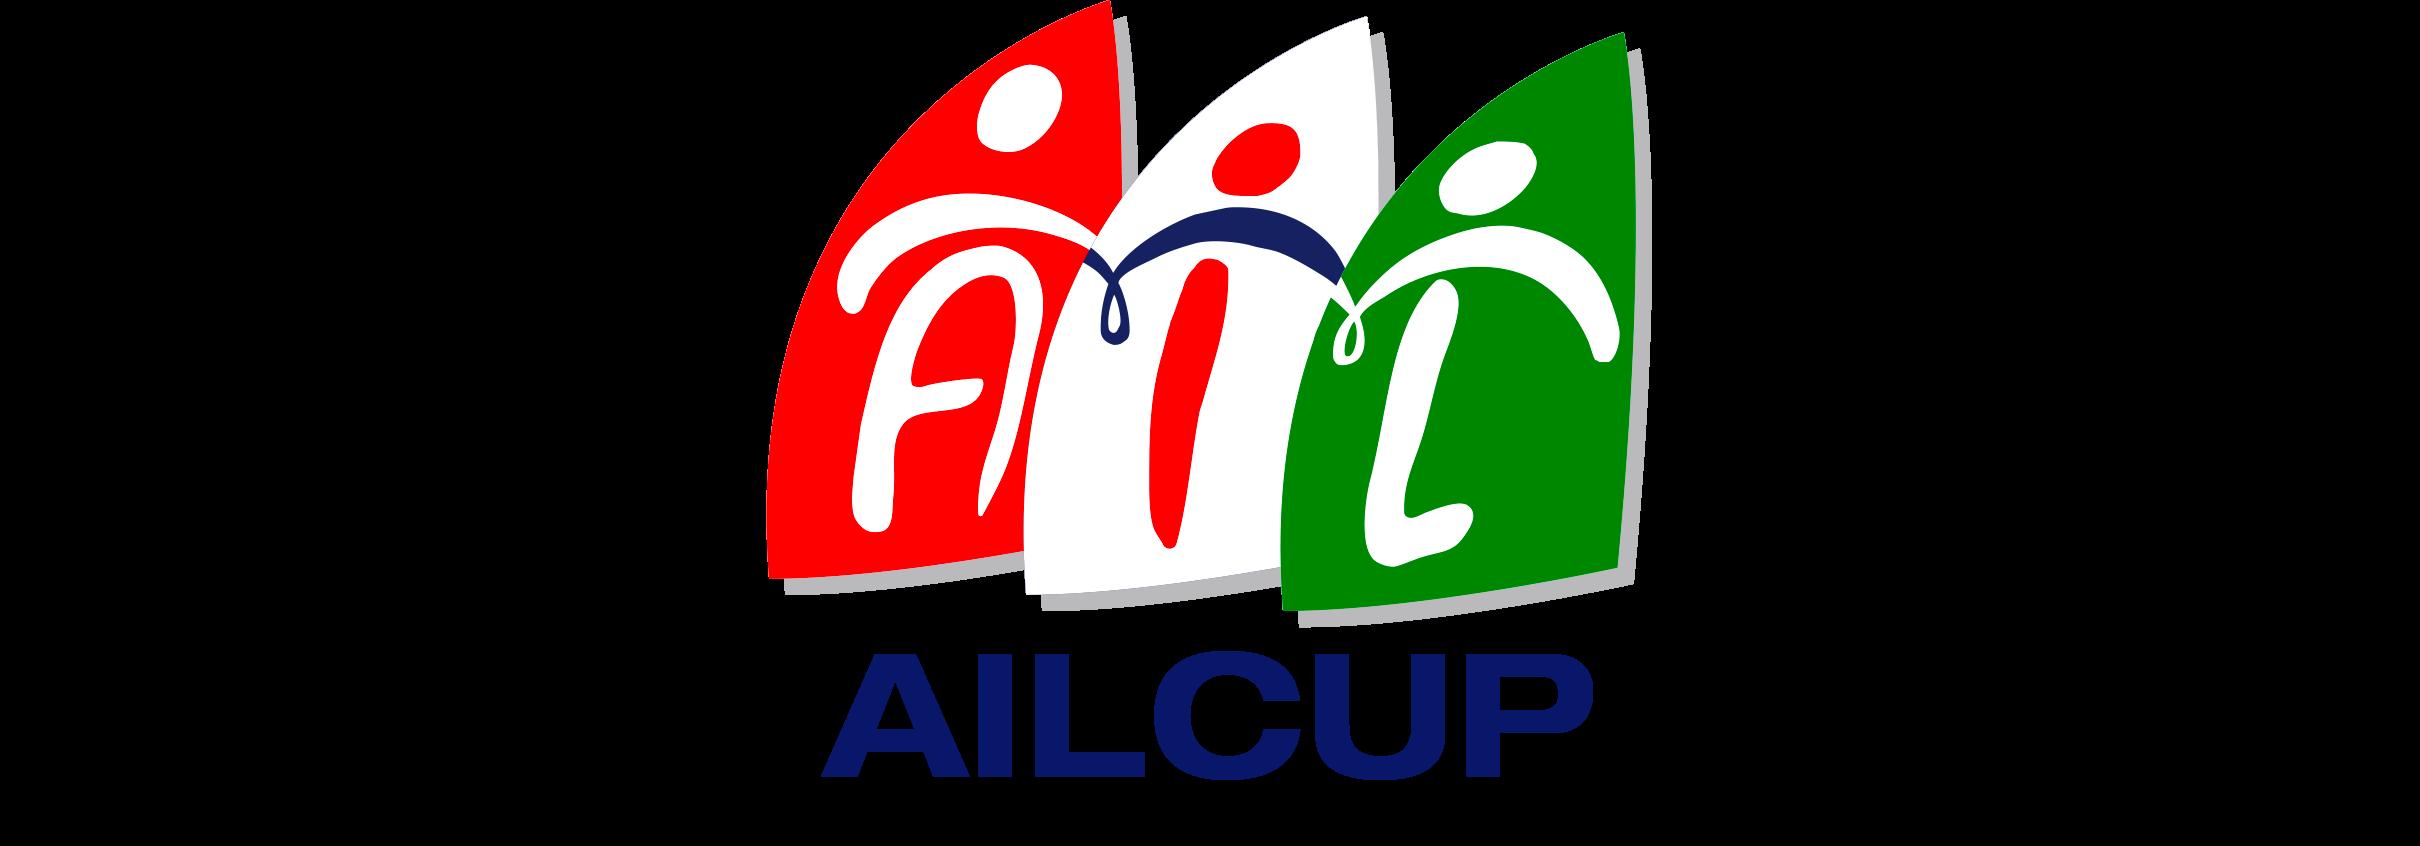 AIL Cup - Memorial Paolo Mazzotti